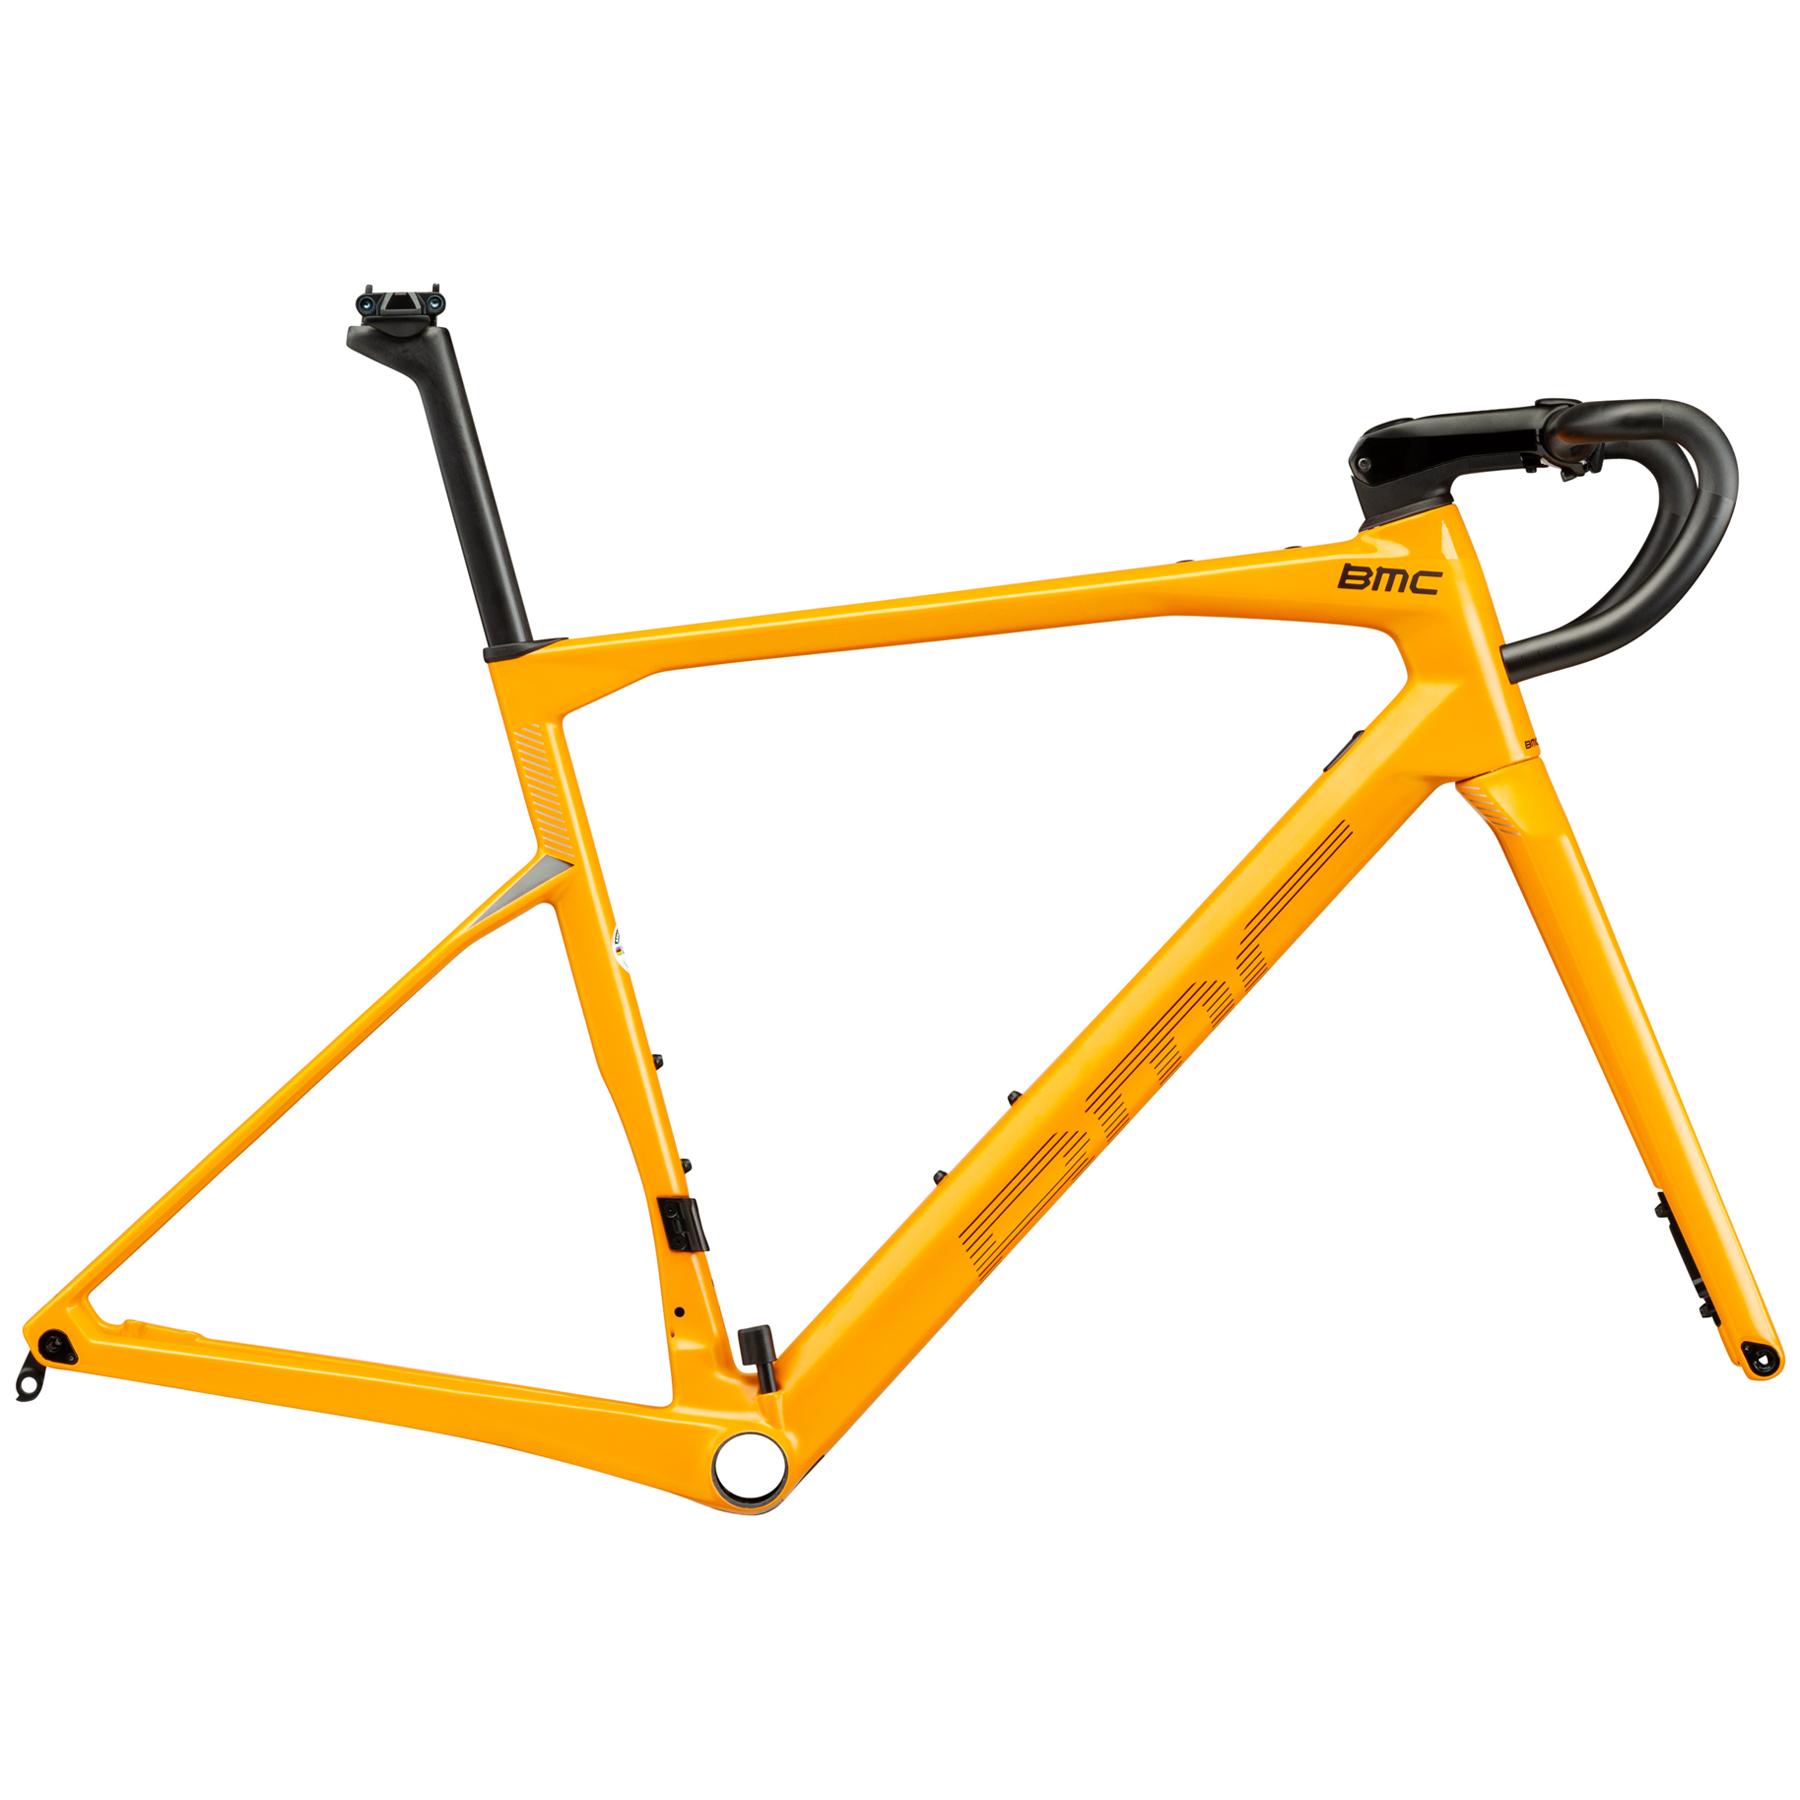 Image of BMC ROADMACHINE 01 MODULE - Carbon Frame Set - 2021 - canary yellow & white